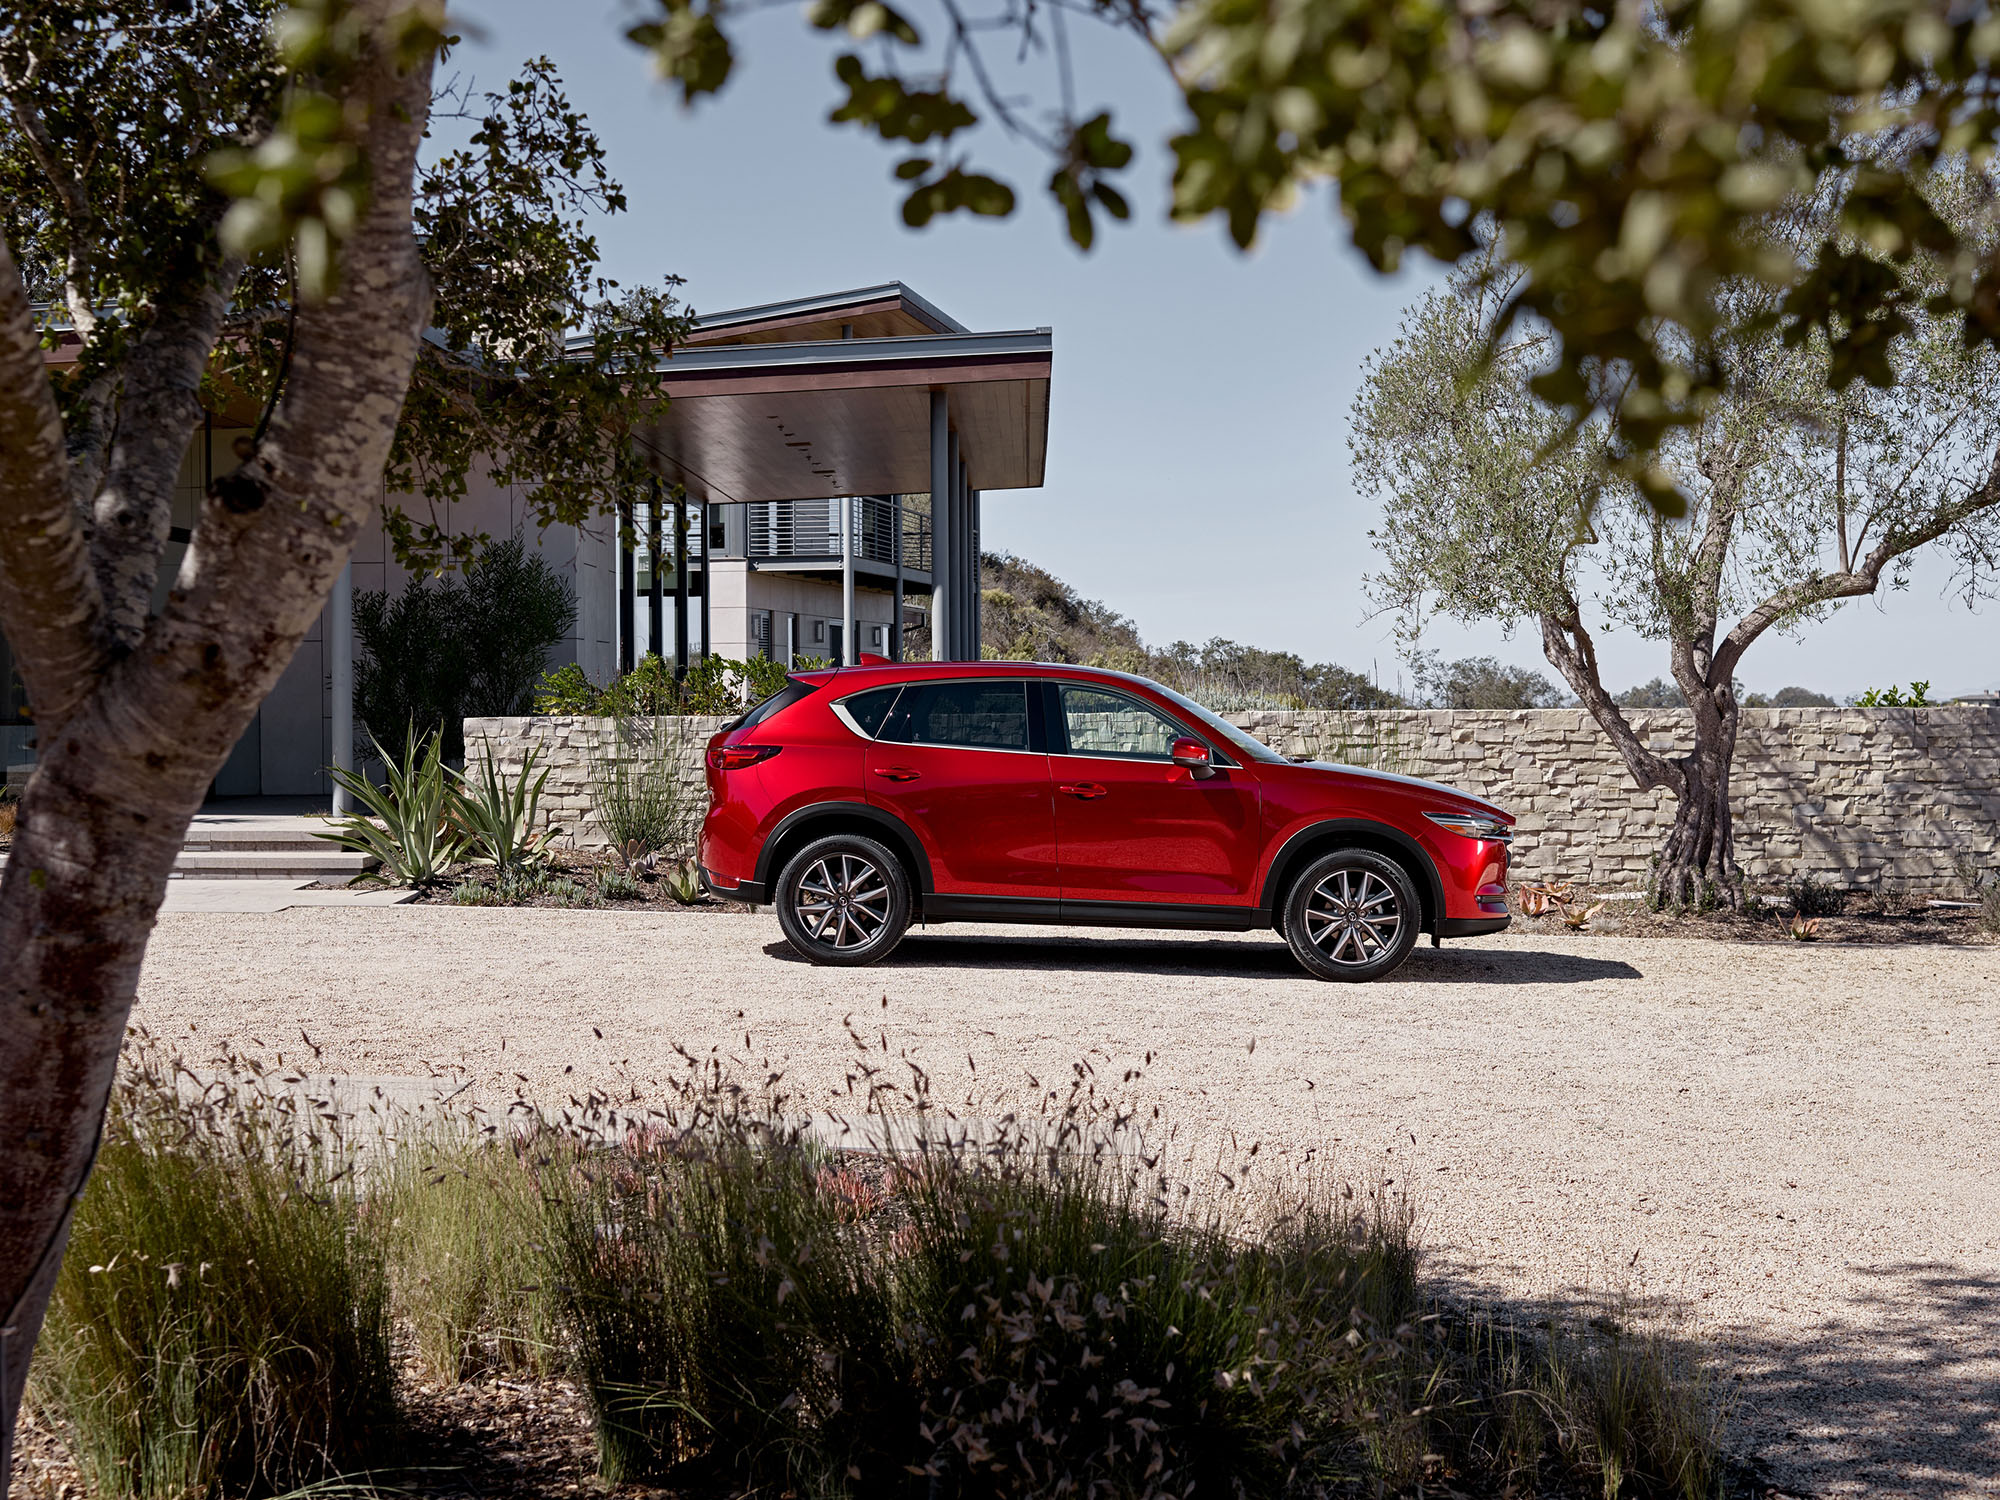 2019 Mazda CX-5 to get SKYACTIV-G 2 5 T engine! - Motor